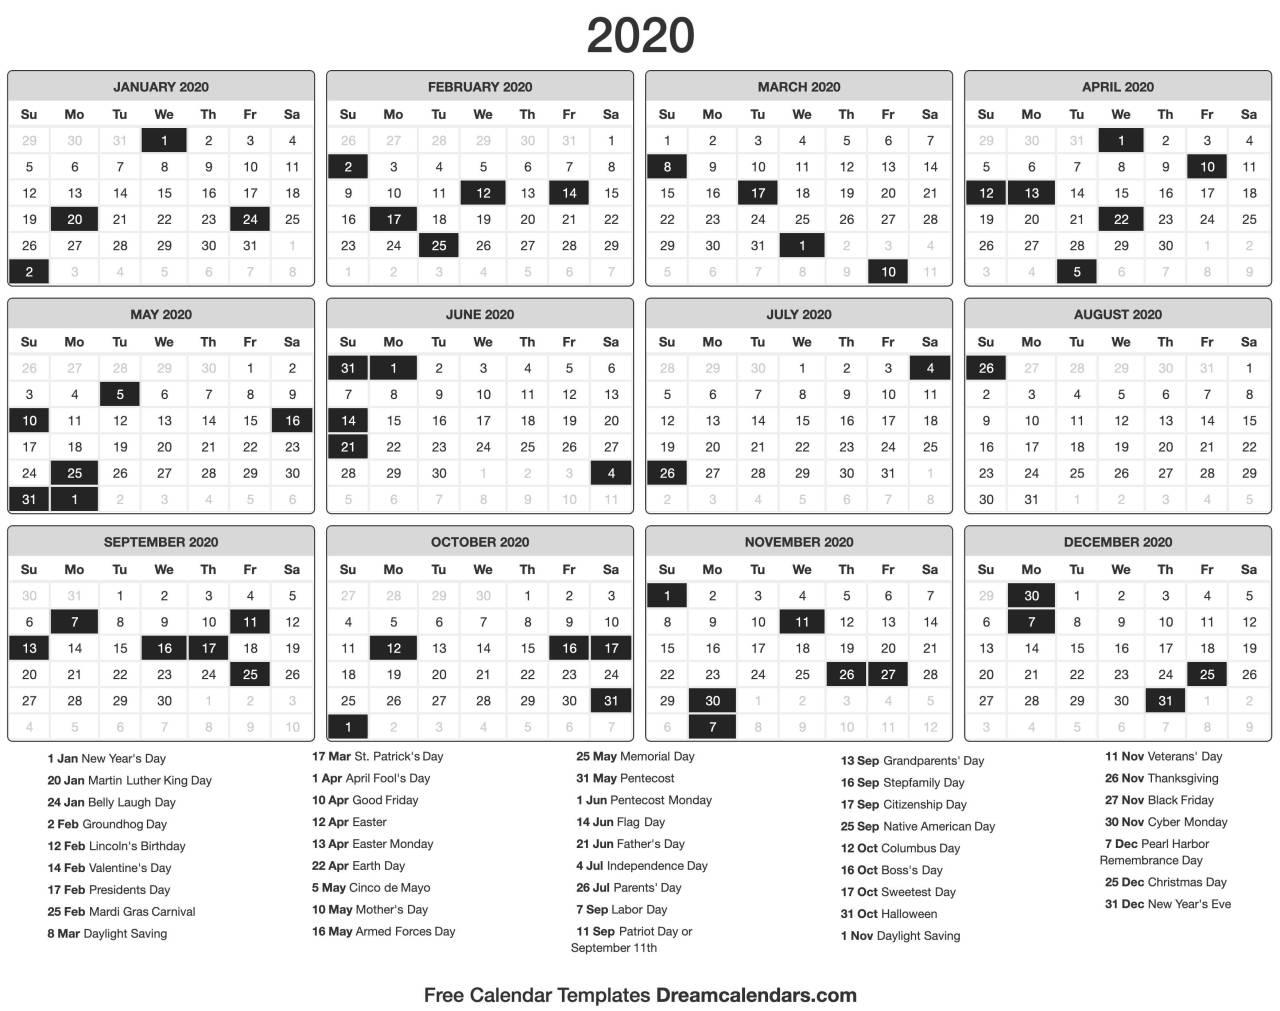 Julian Date 2021 | Calendar 2020 Template Within Julian Date Conversion 2021